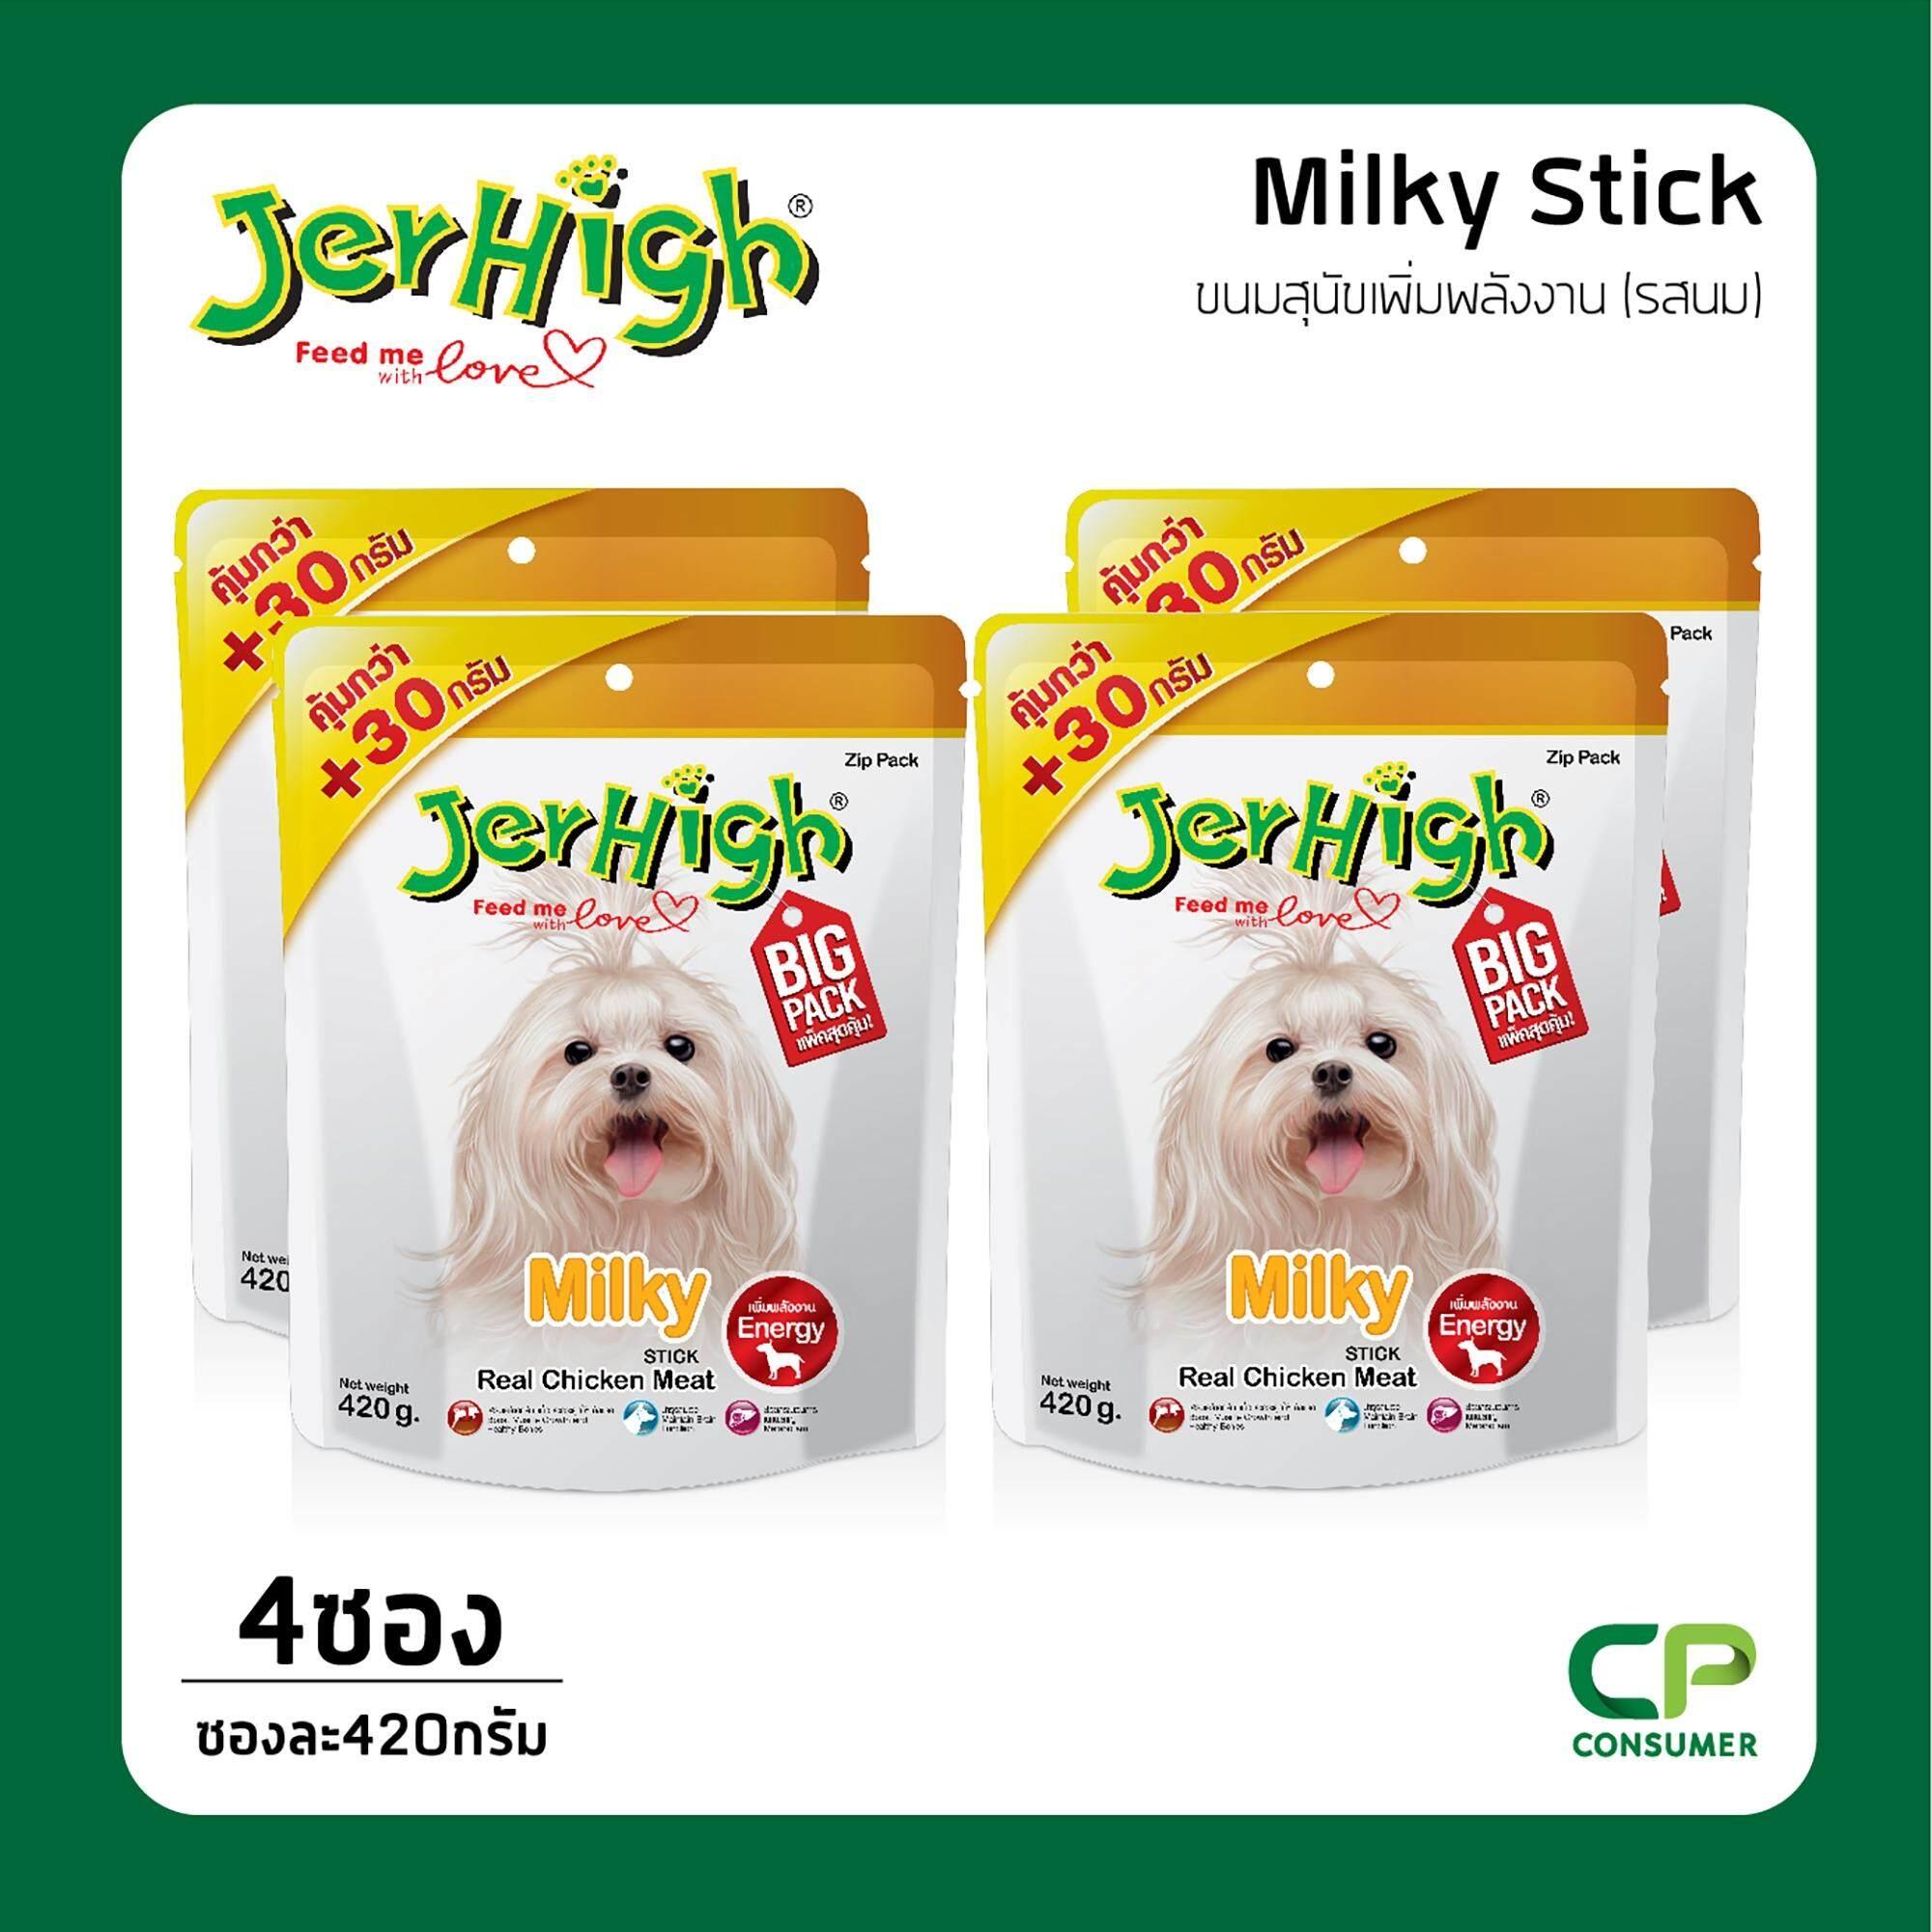 Jerhigh Milky Stick ขนมสุนัขเพิ่มพลังงาน ซอง 420 กรัม X 4.